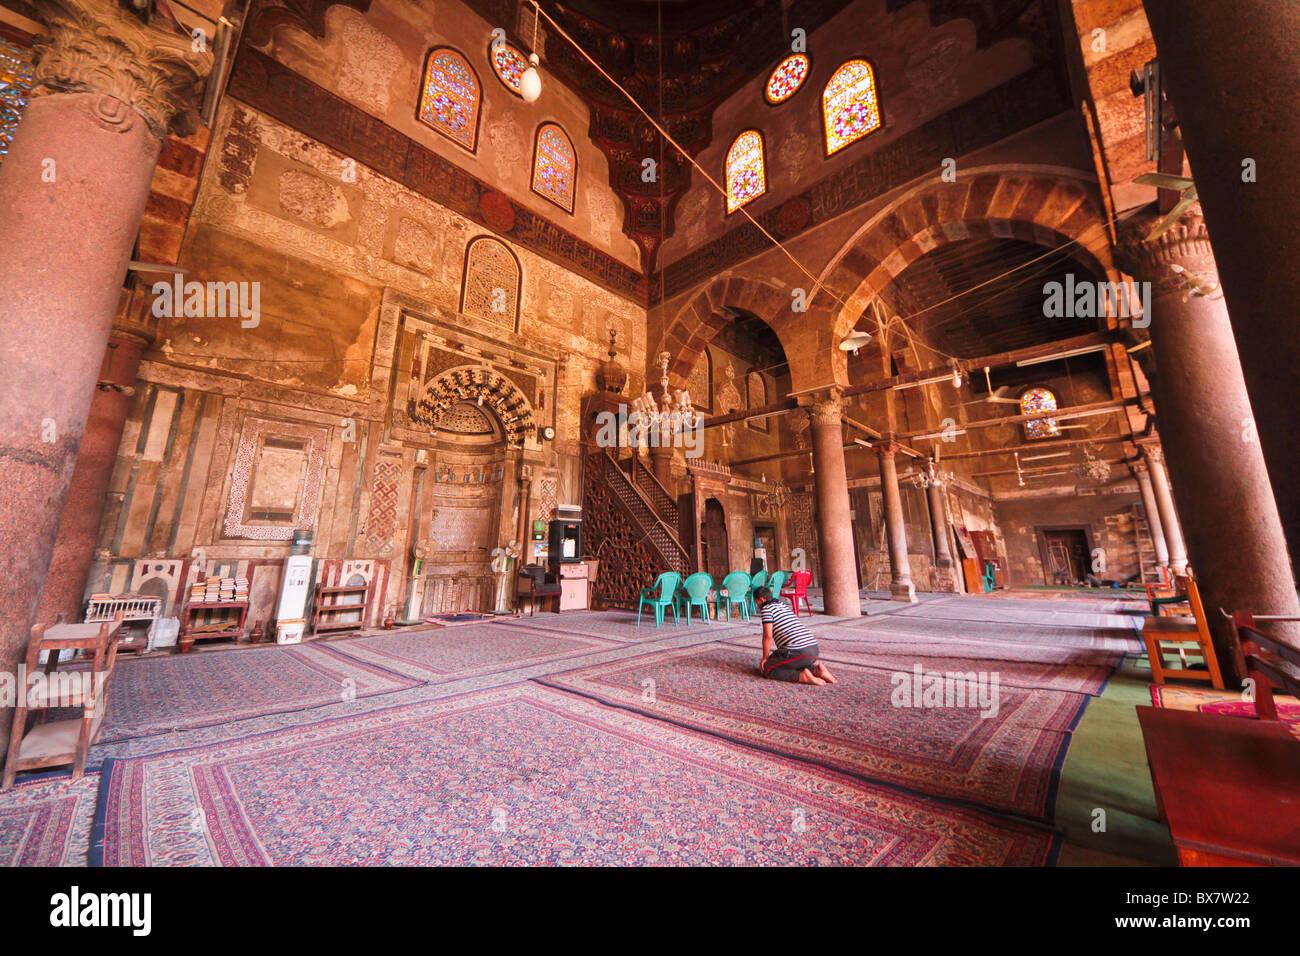 qibla prayer hall, mosque of al-Maridani, Cairo, Egypt - Stock Image